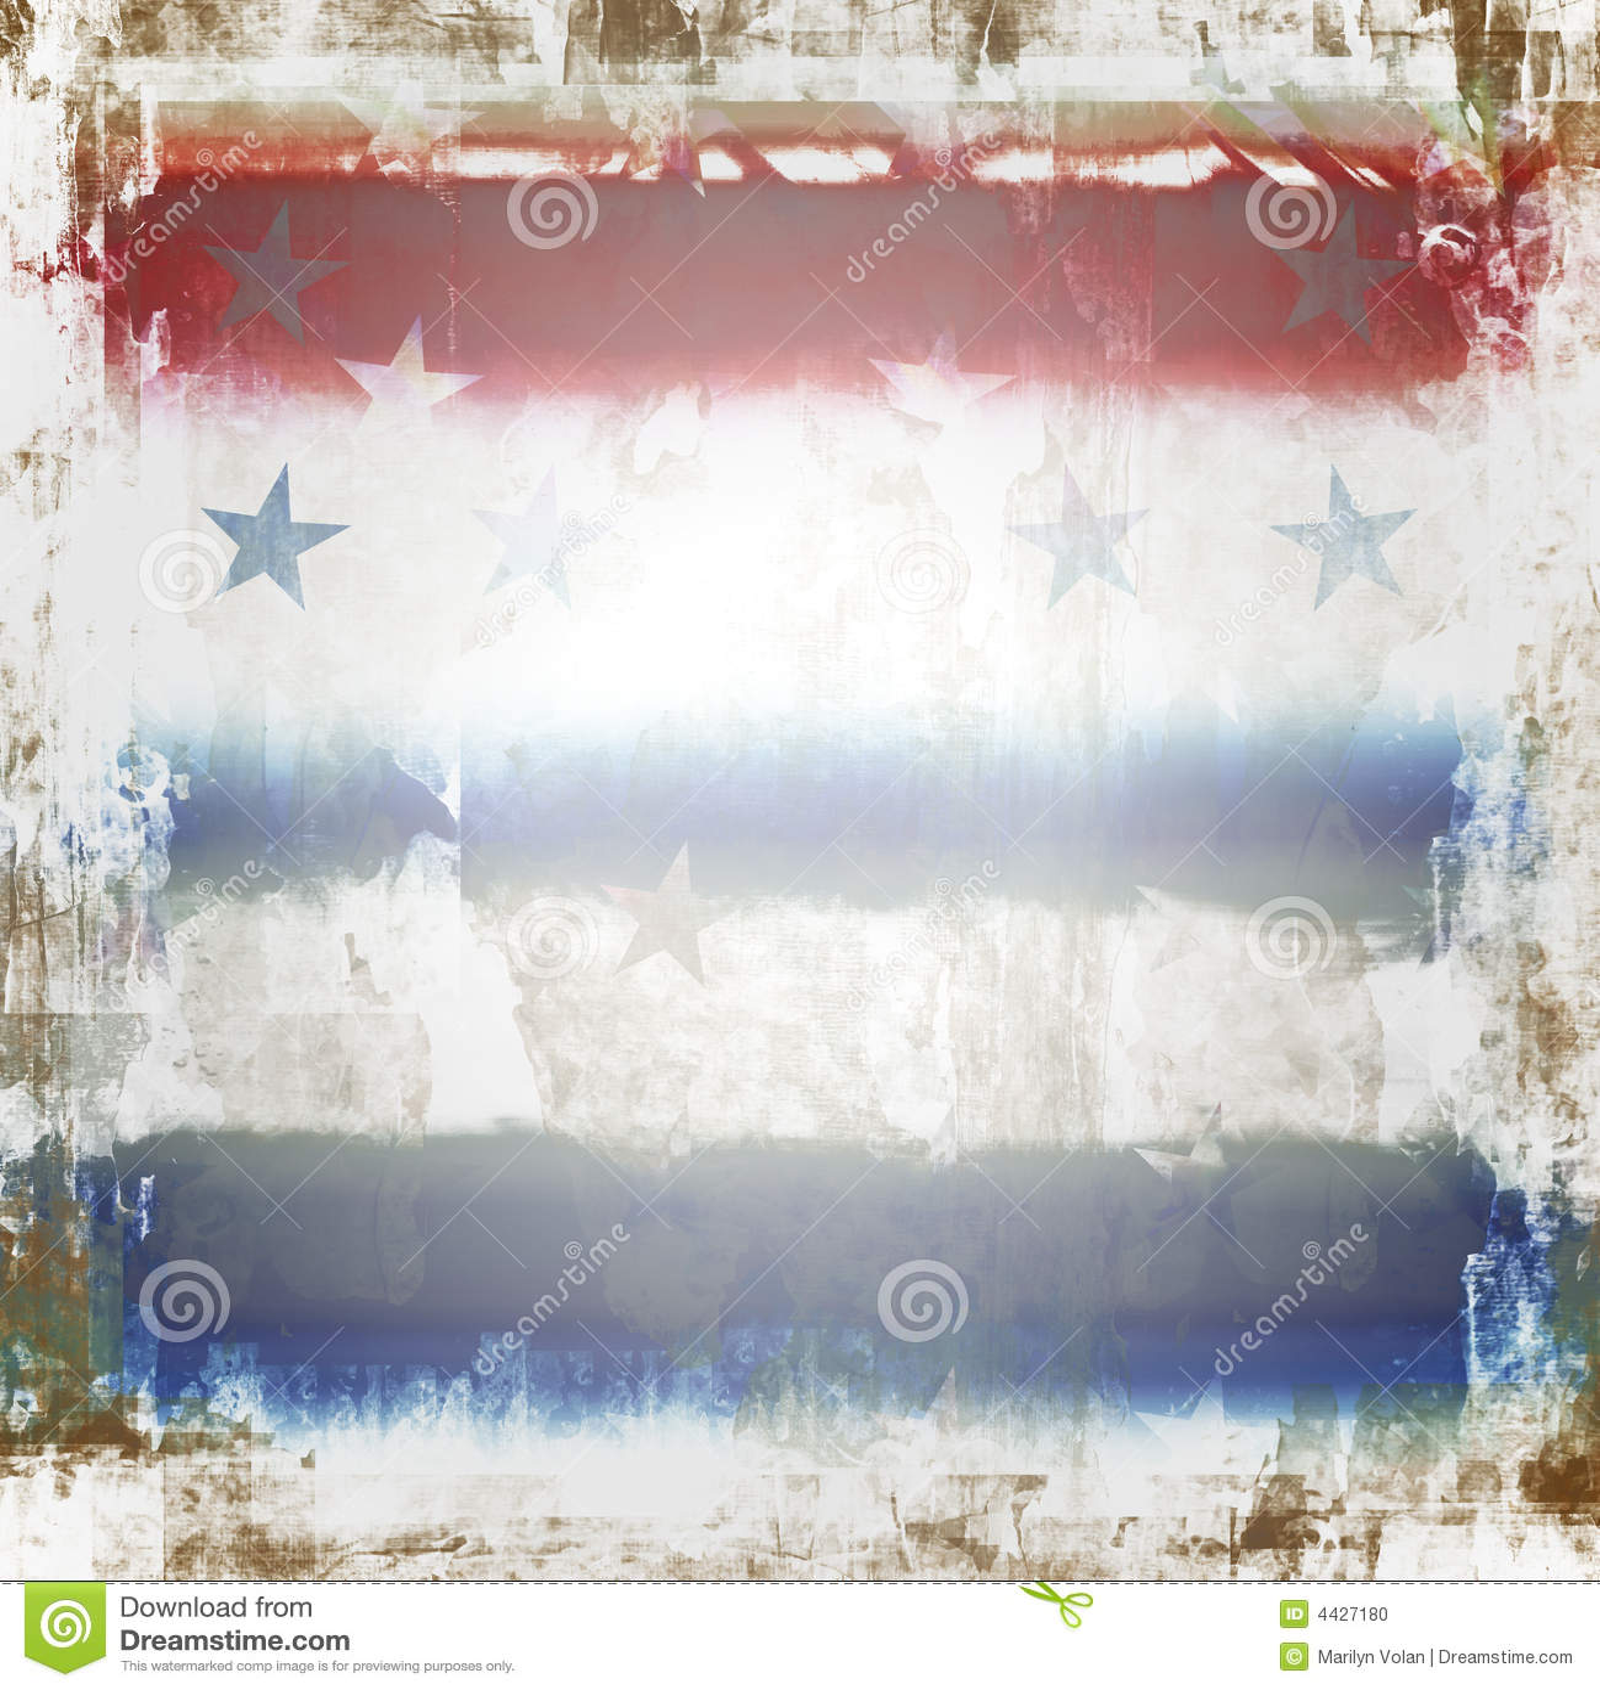 Patriotic stars and stripes grunge